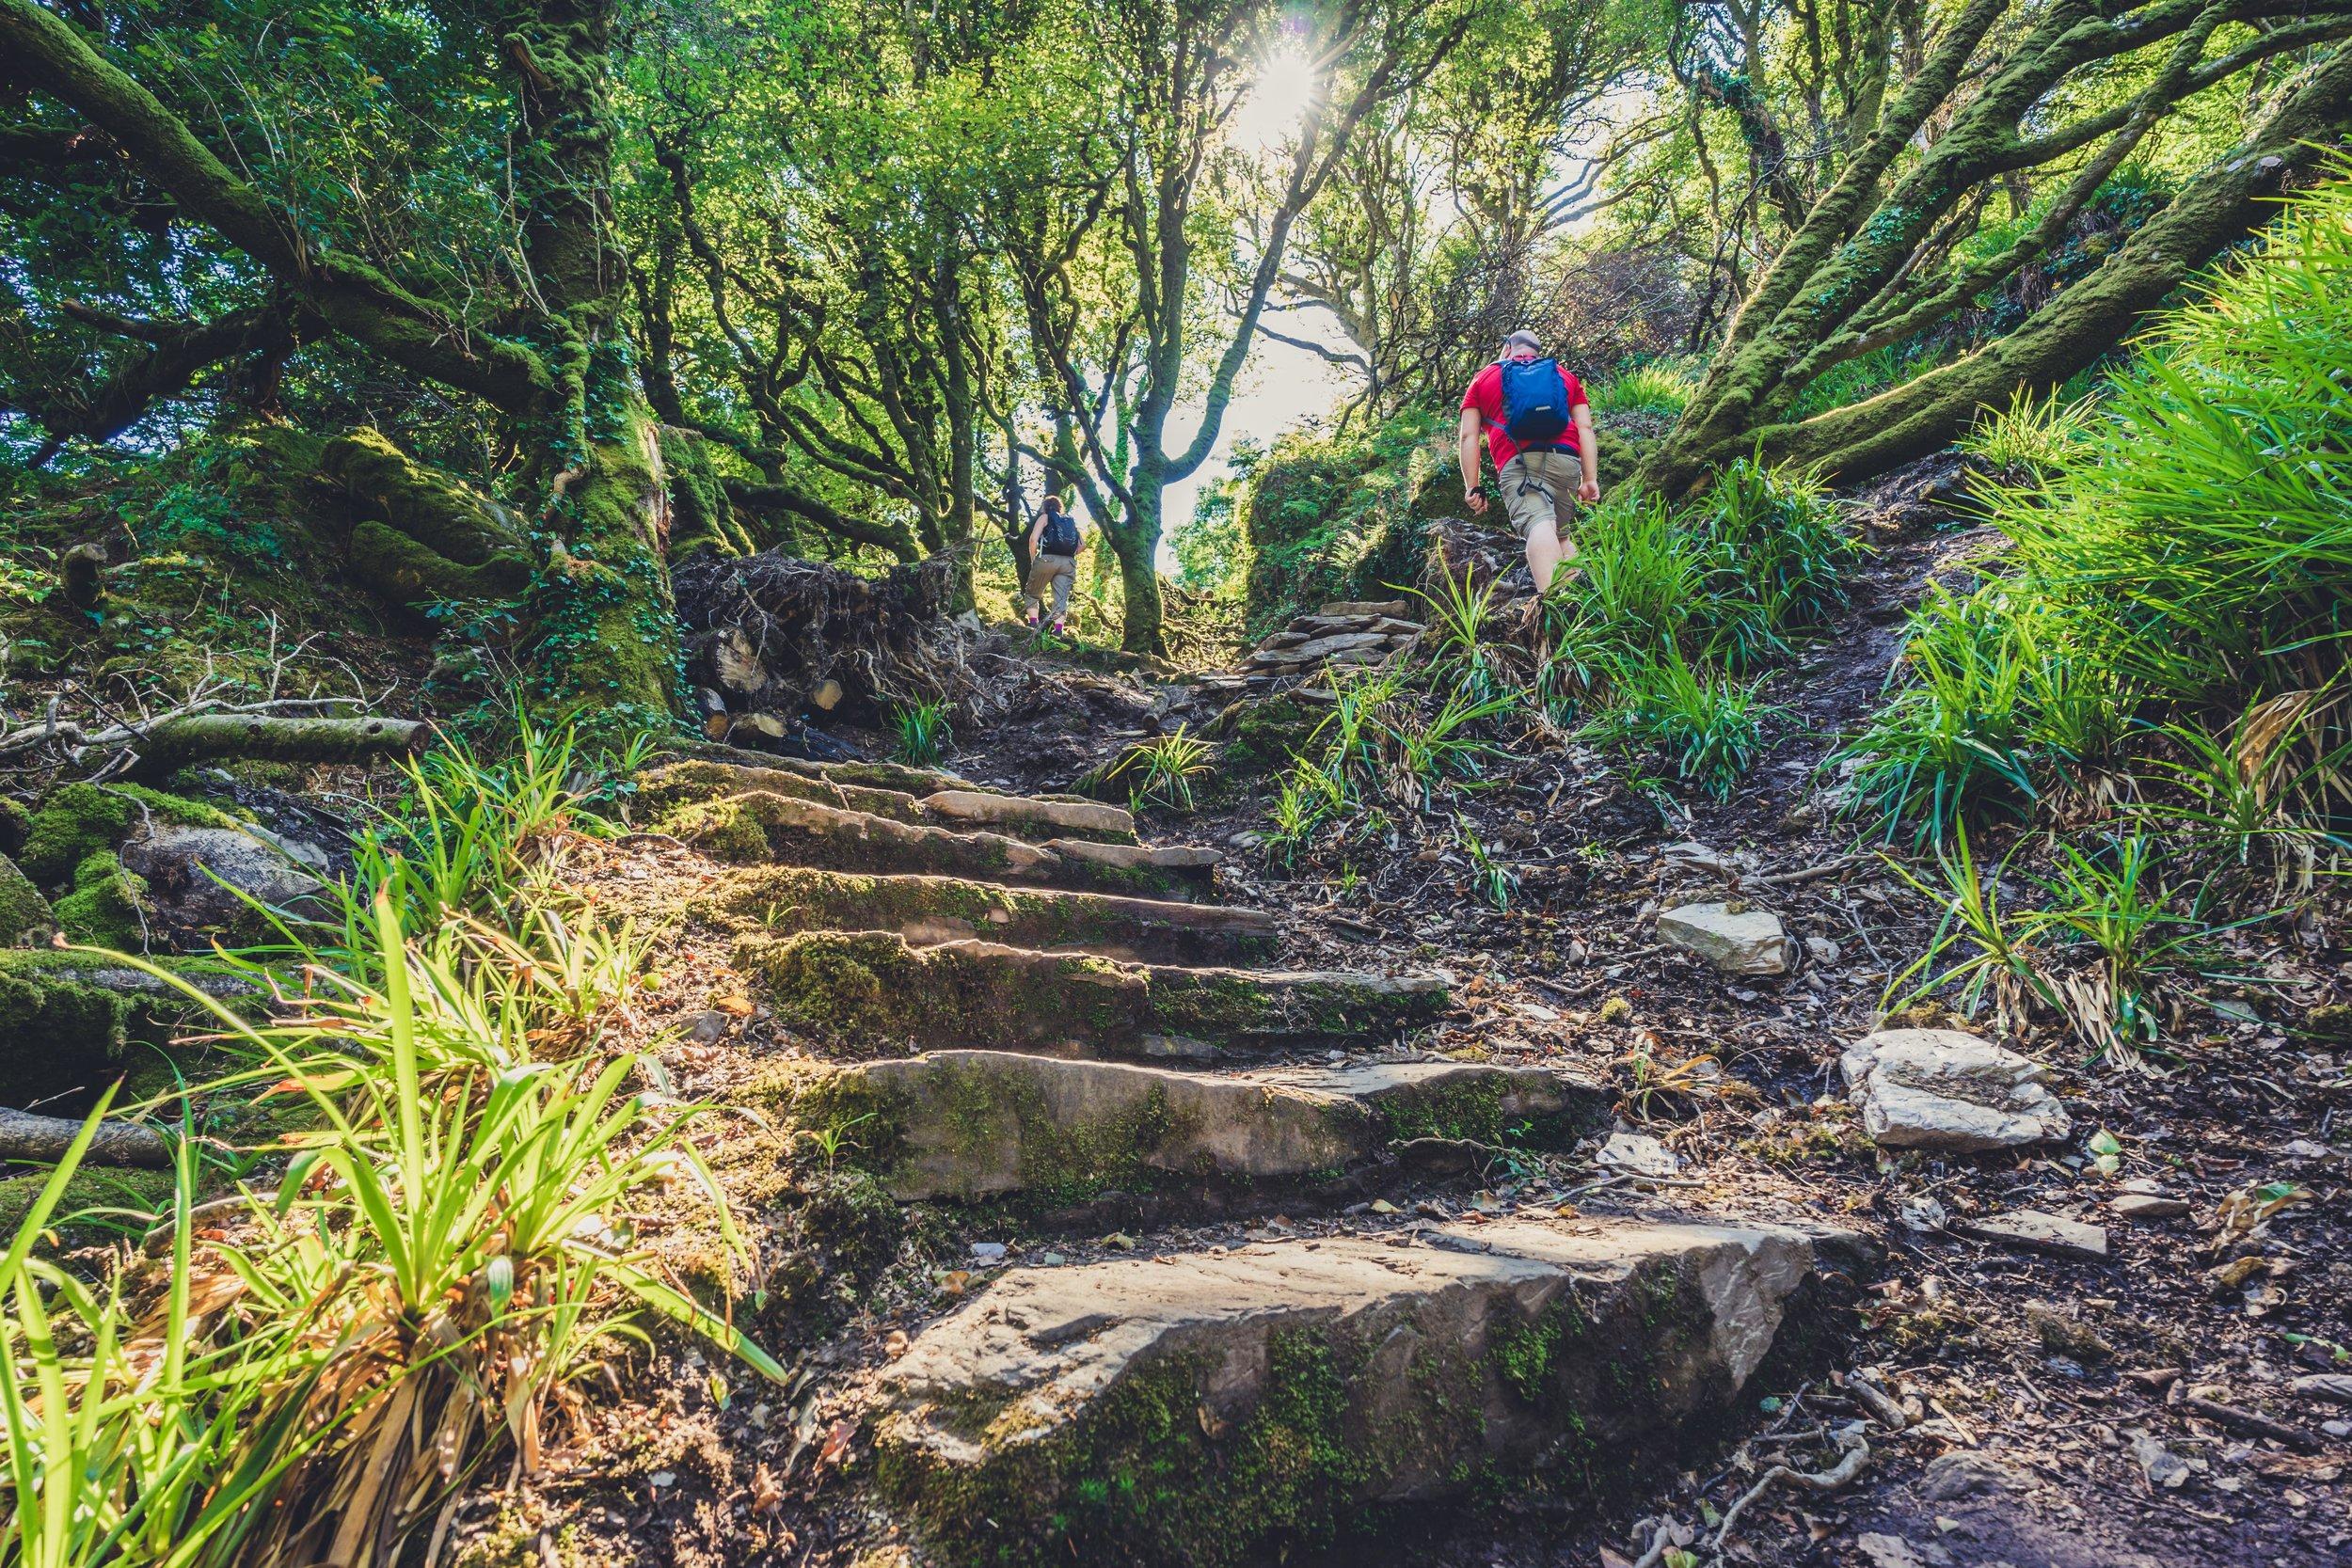 county cork. cork. ireland. irish. history. city. house sitting. old. travel. travel photography. travel photographer. lough hyne. hiking. outdoor. adventure. hiking. the stairs up.jpg